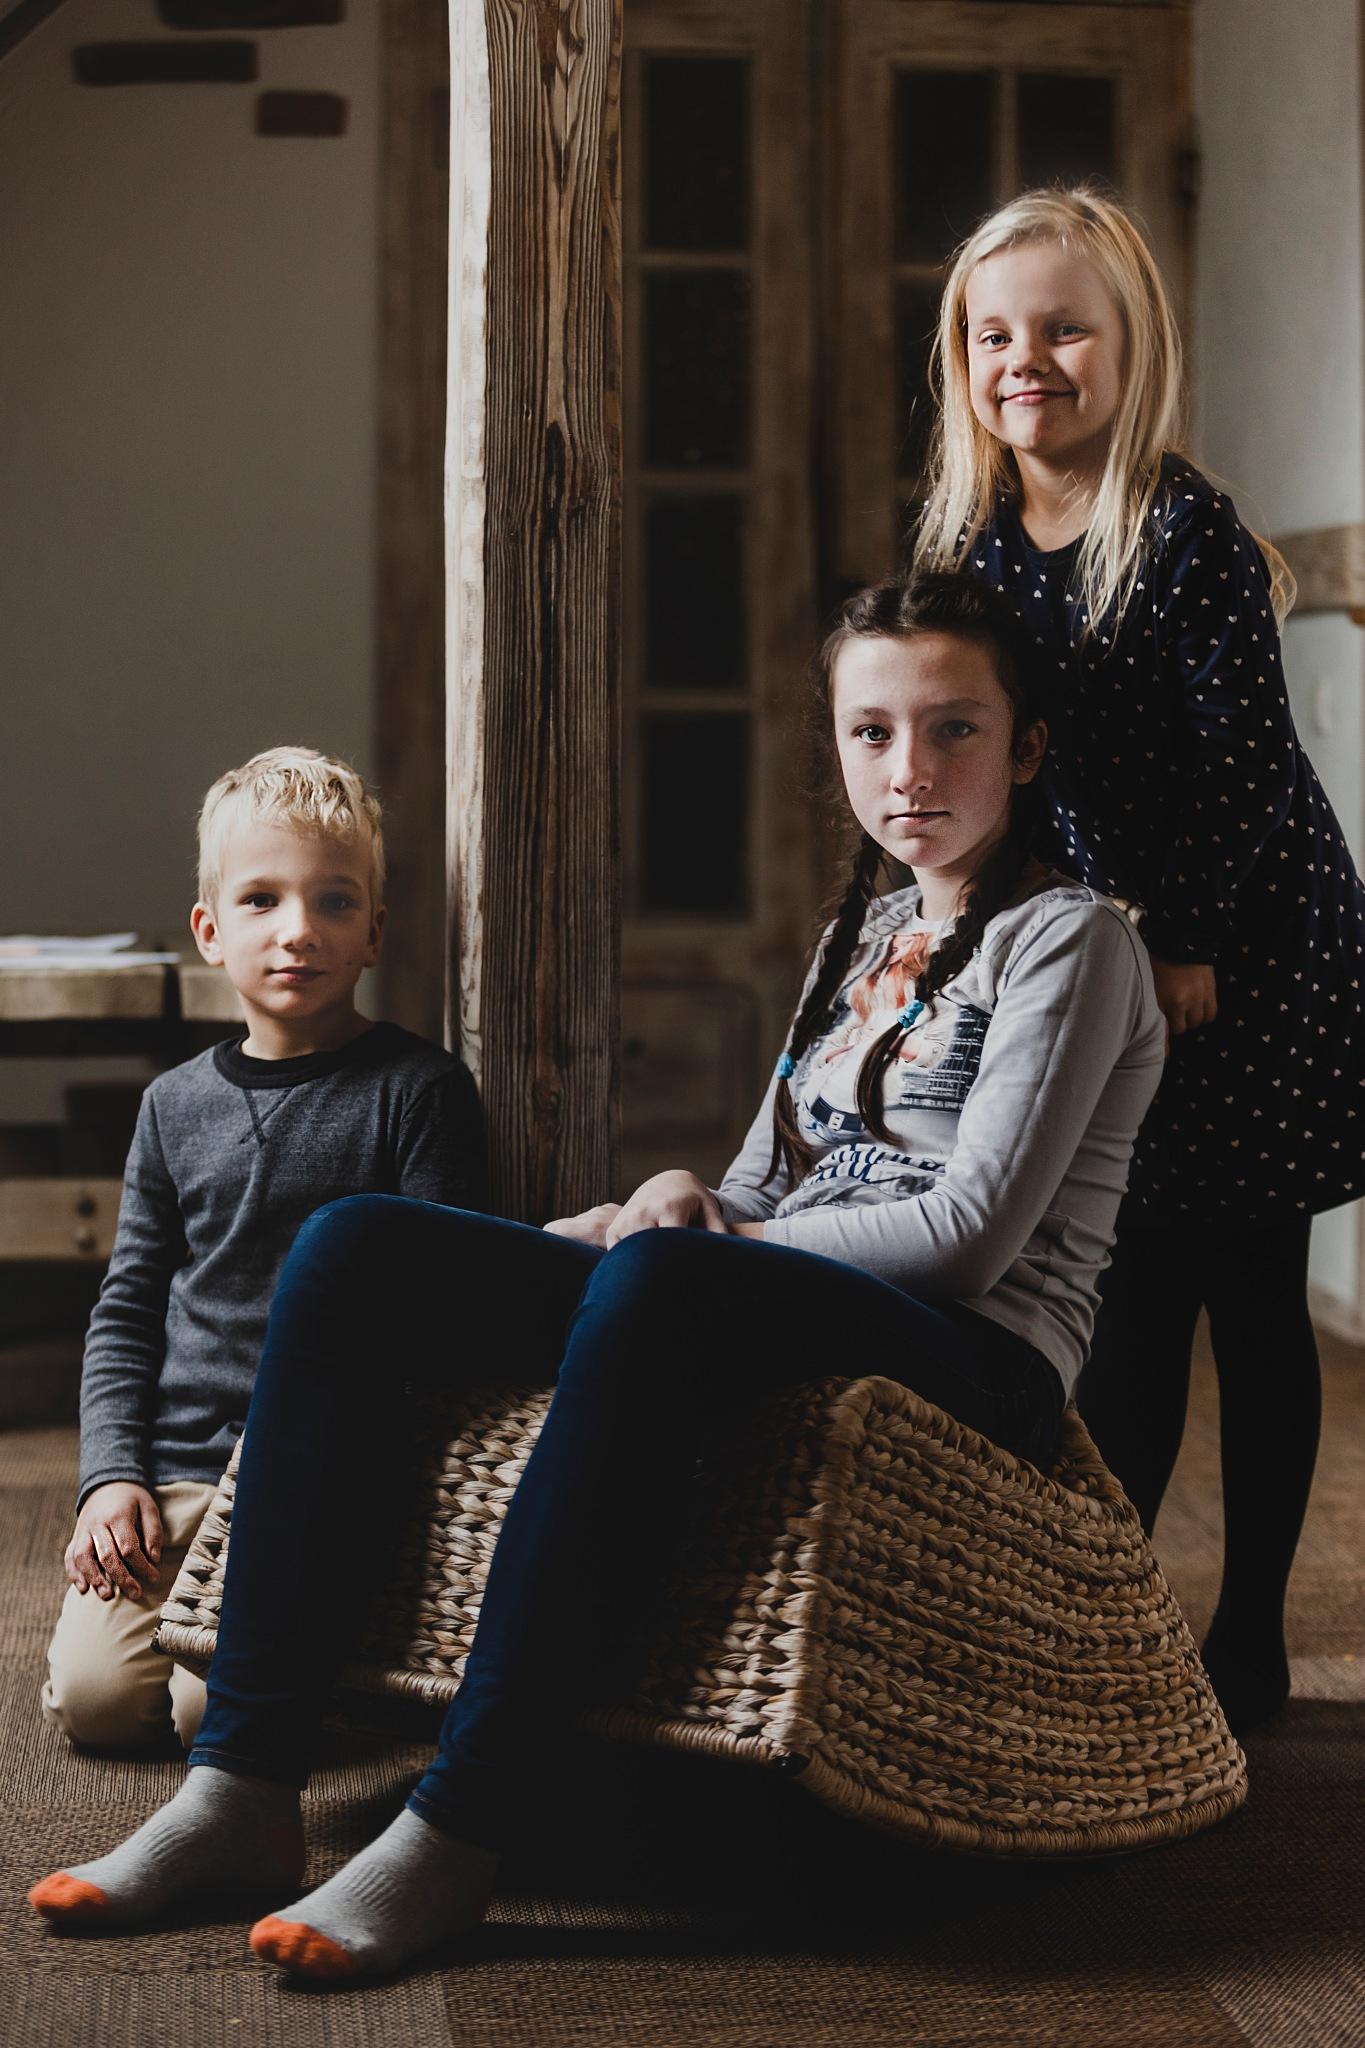 Kids by AndrisRutulis